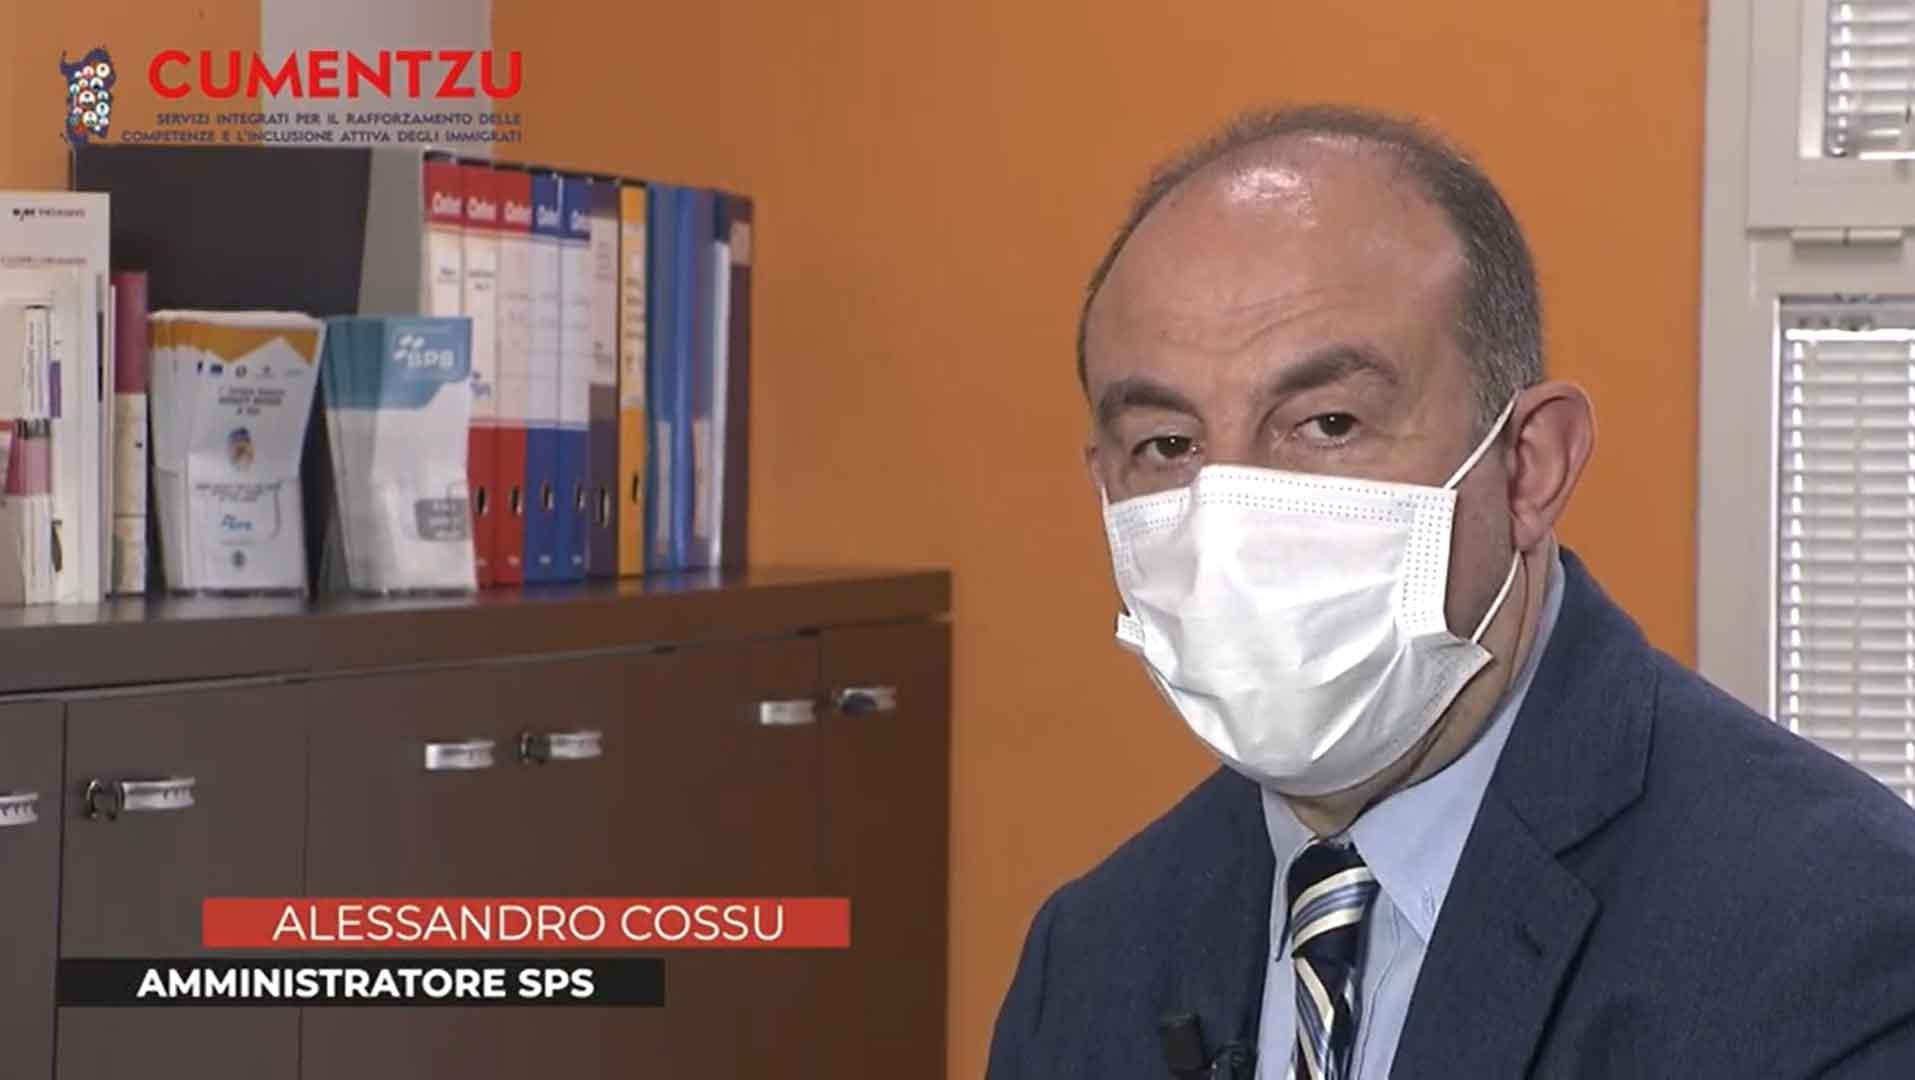 INTERVISTA ALESSANDRO COSSU